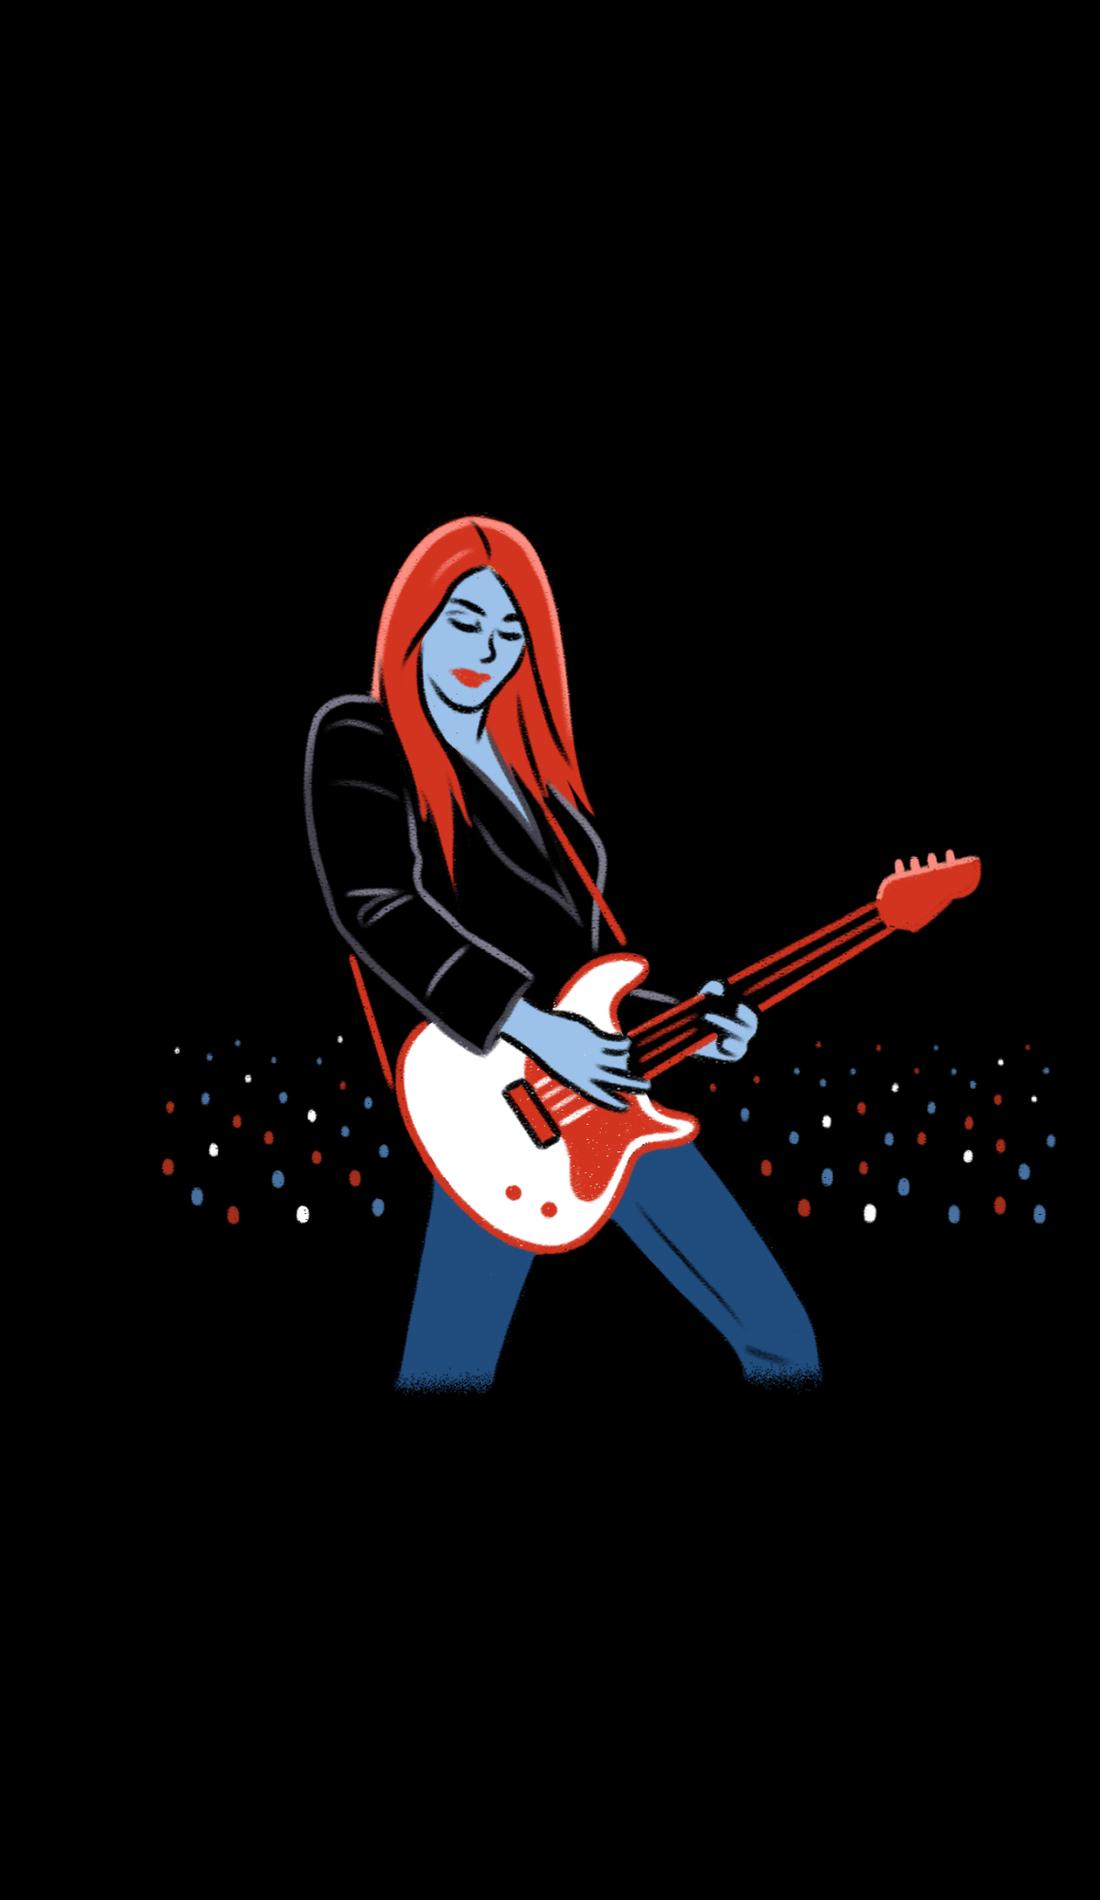 A Levitation Room live event